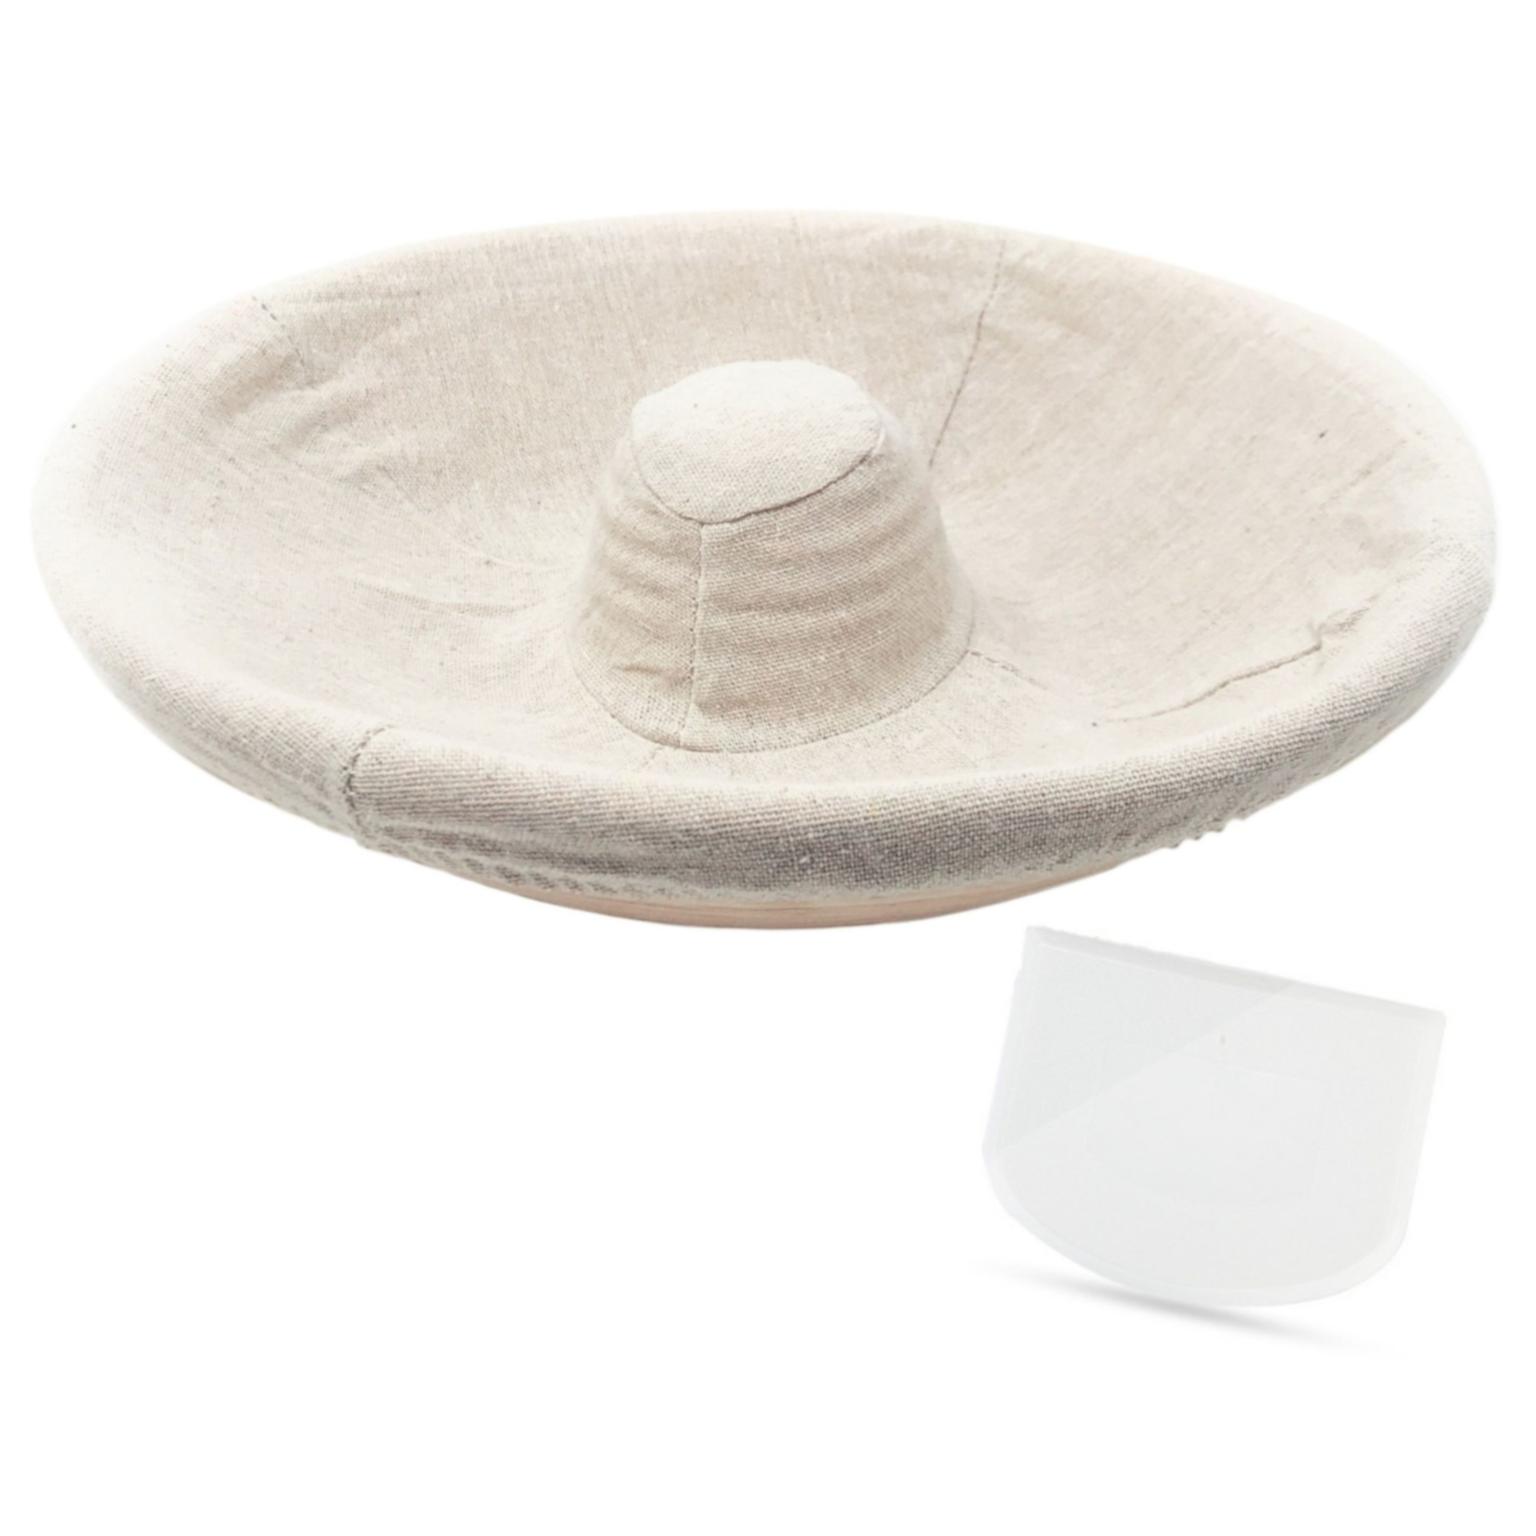 Amazon.com: Premium Long Oval Banneton Basket with Liner